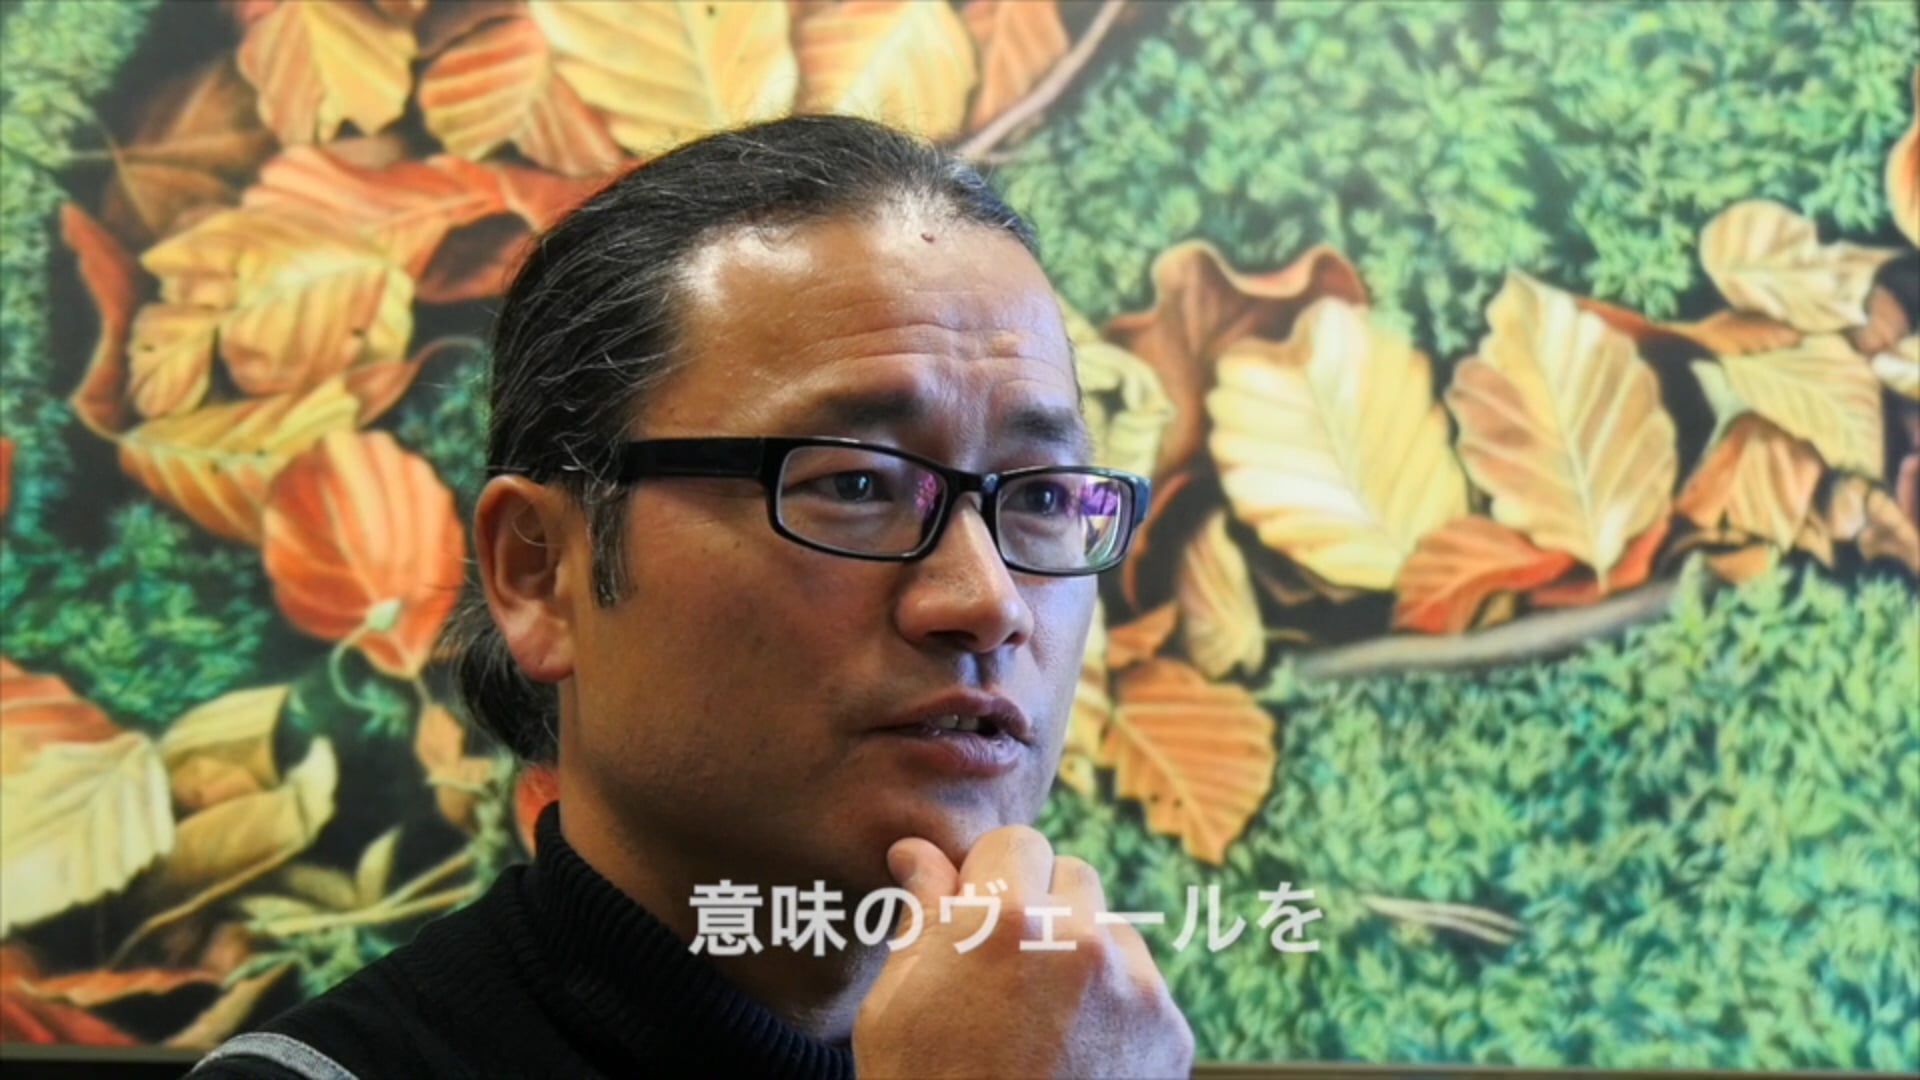 Hideyuki Sobue's Artist Profile